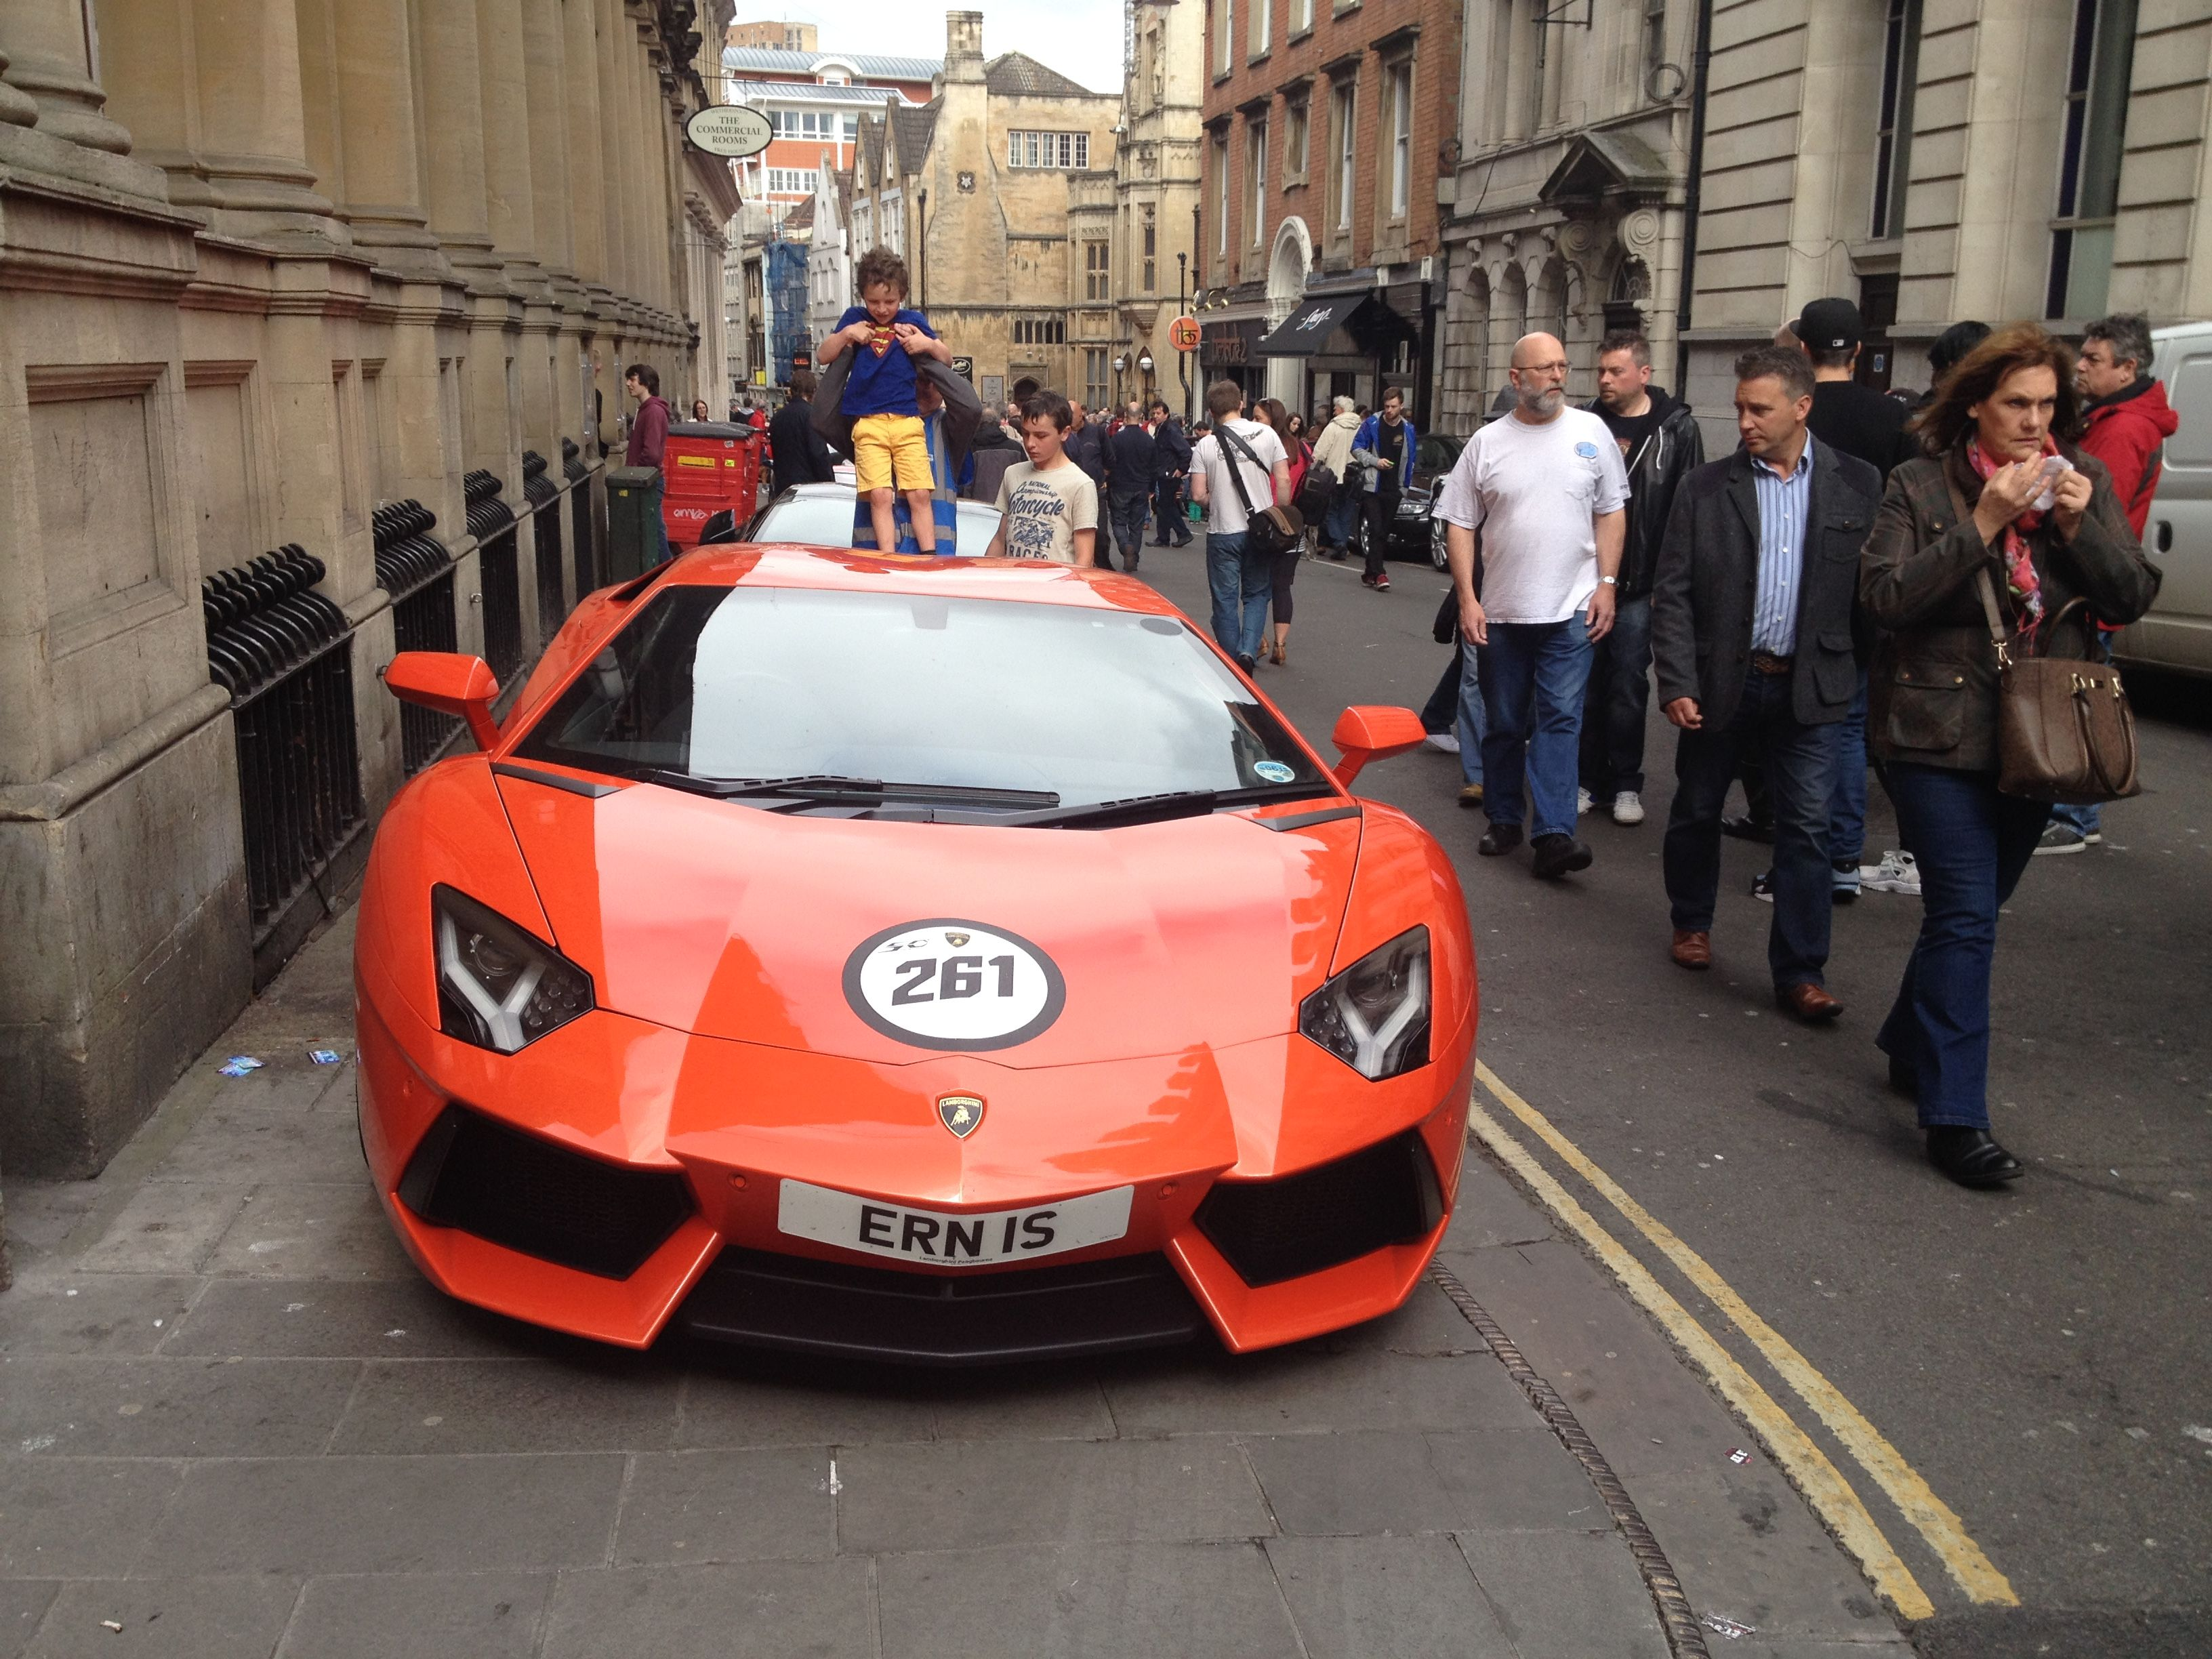 Aventador At The Italian Car Show On Corn Street In Bristol Cars - Italian car show